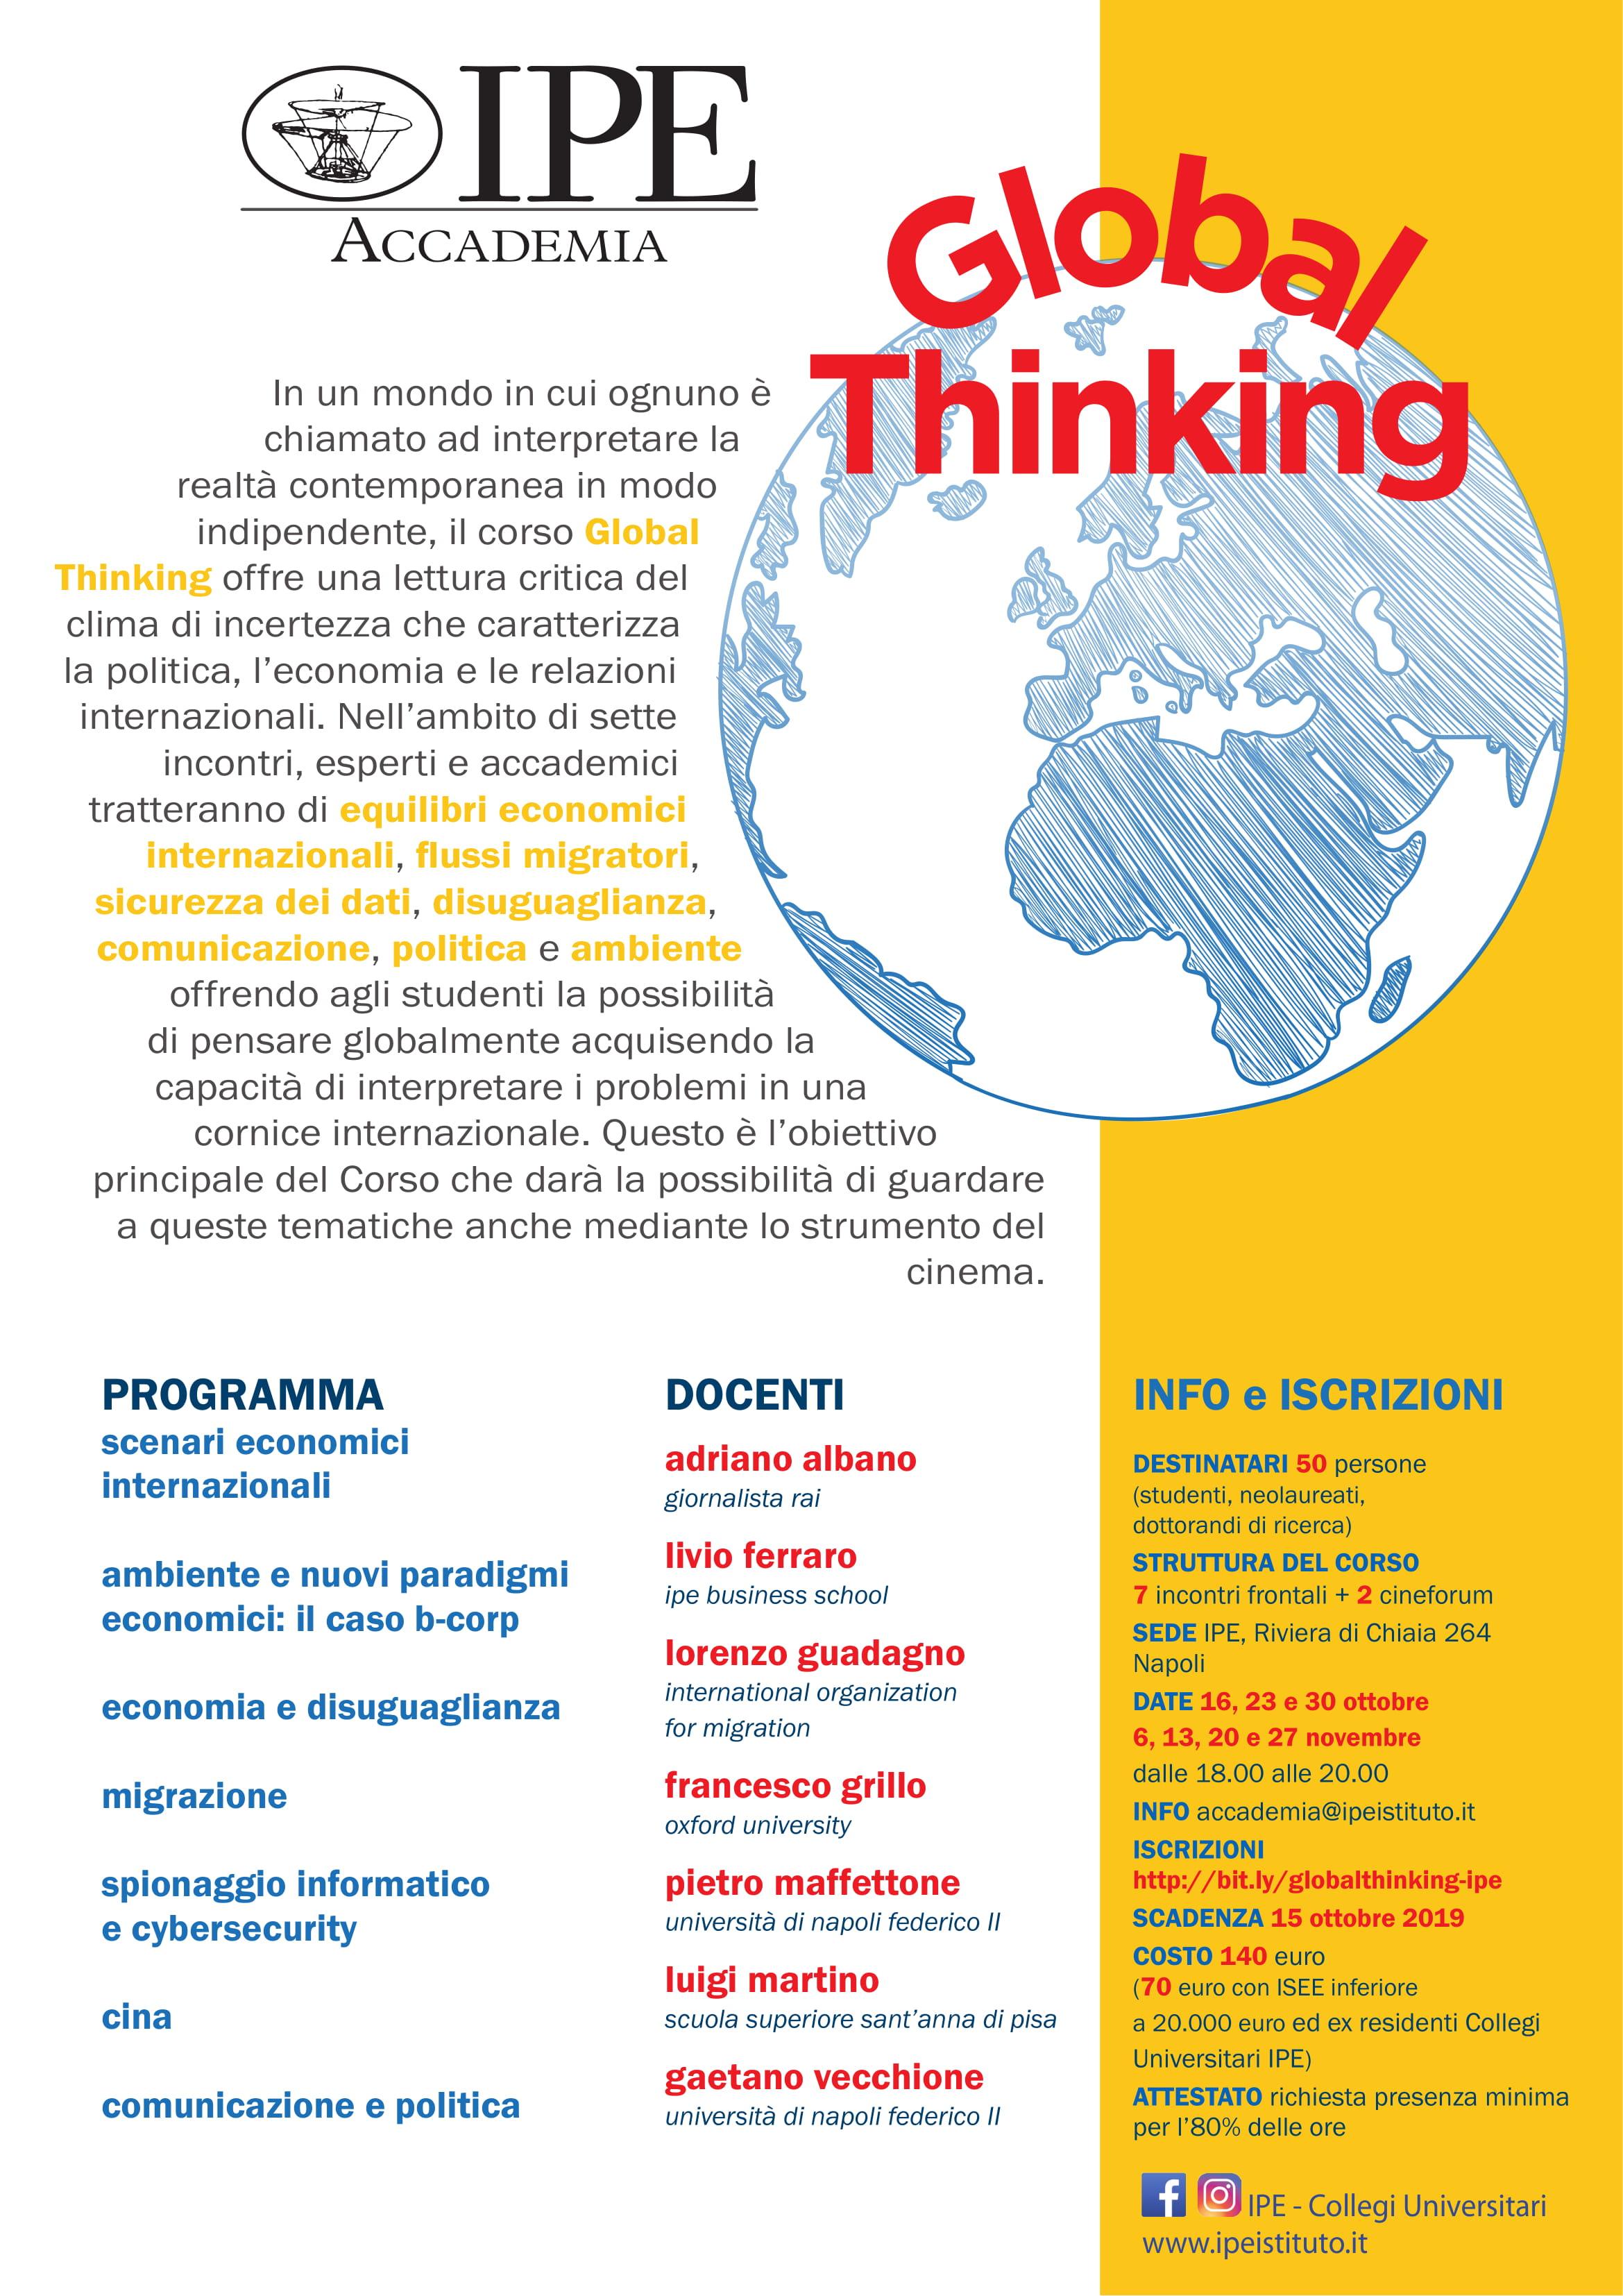 Global Thinking Accademia IPE